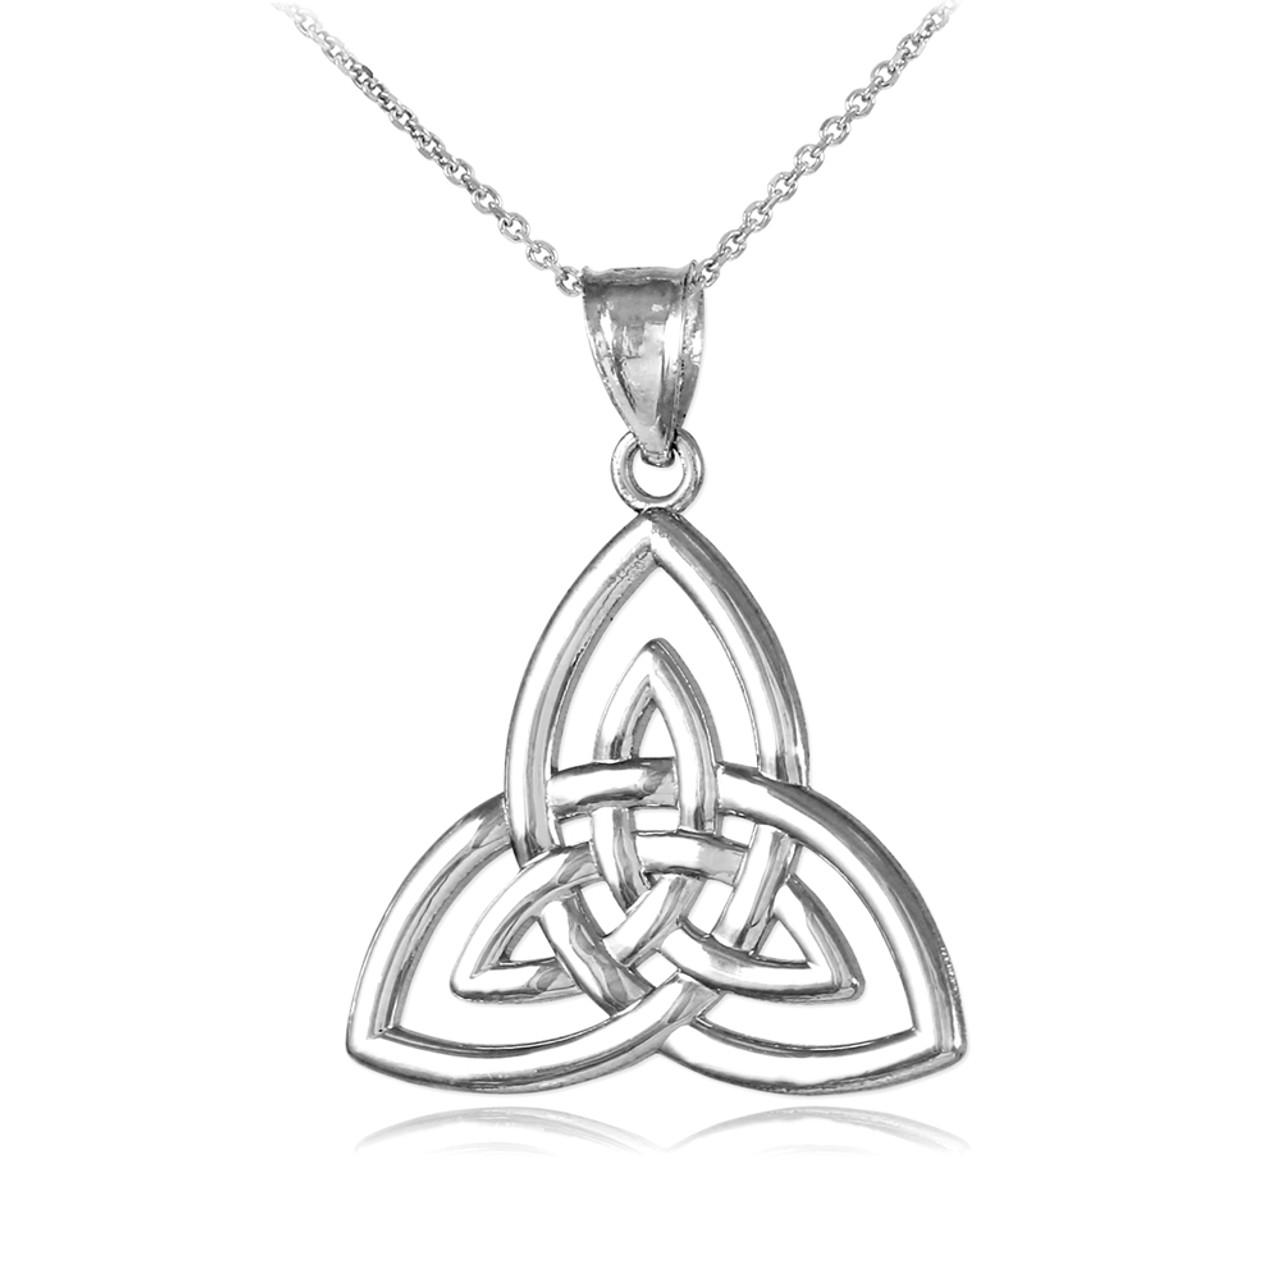 White Gold Triquetra Trinity Knot Pendant